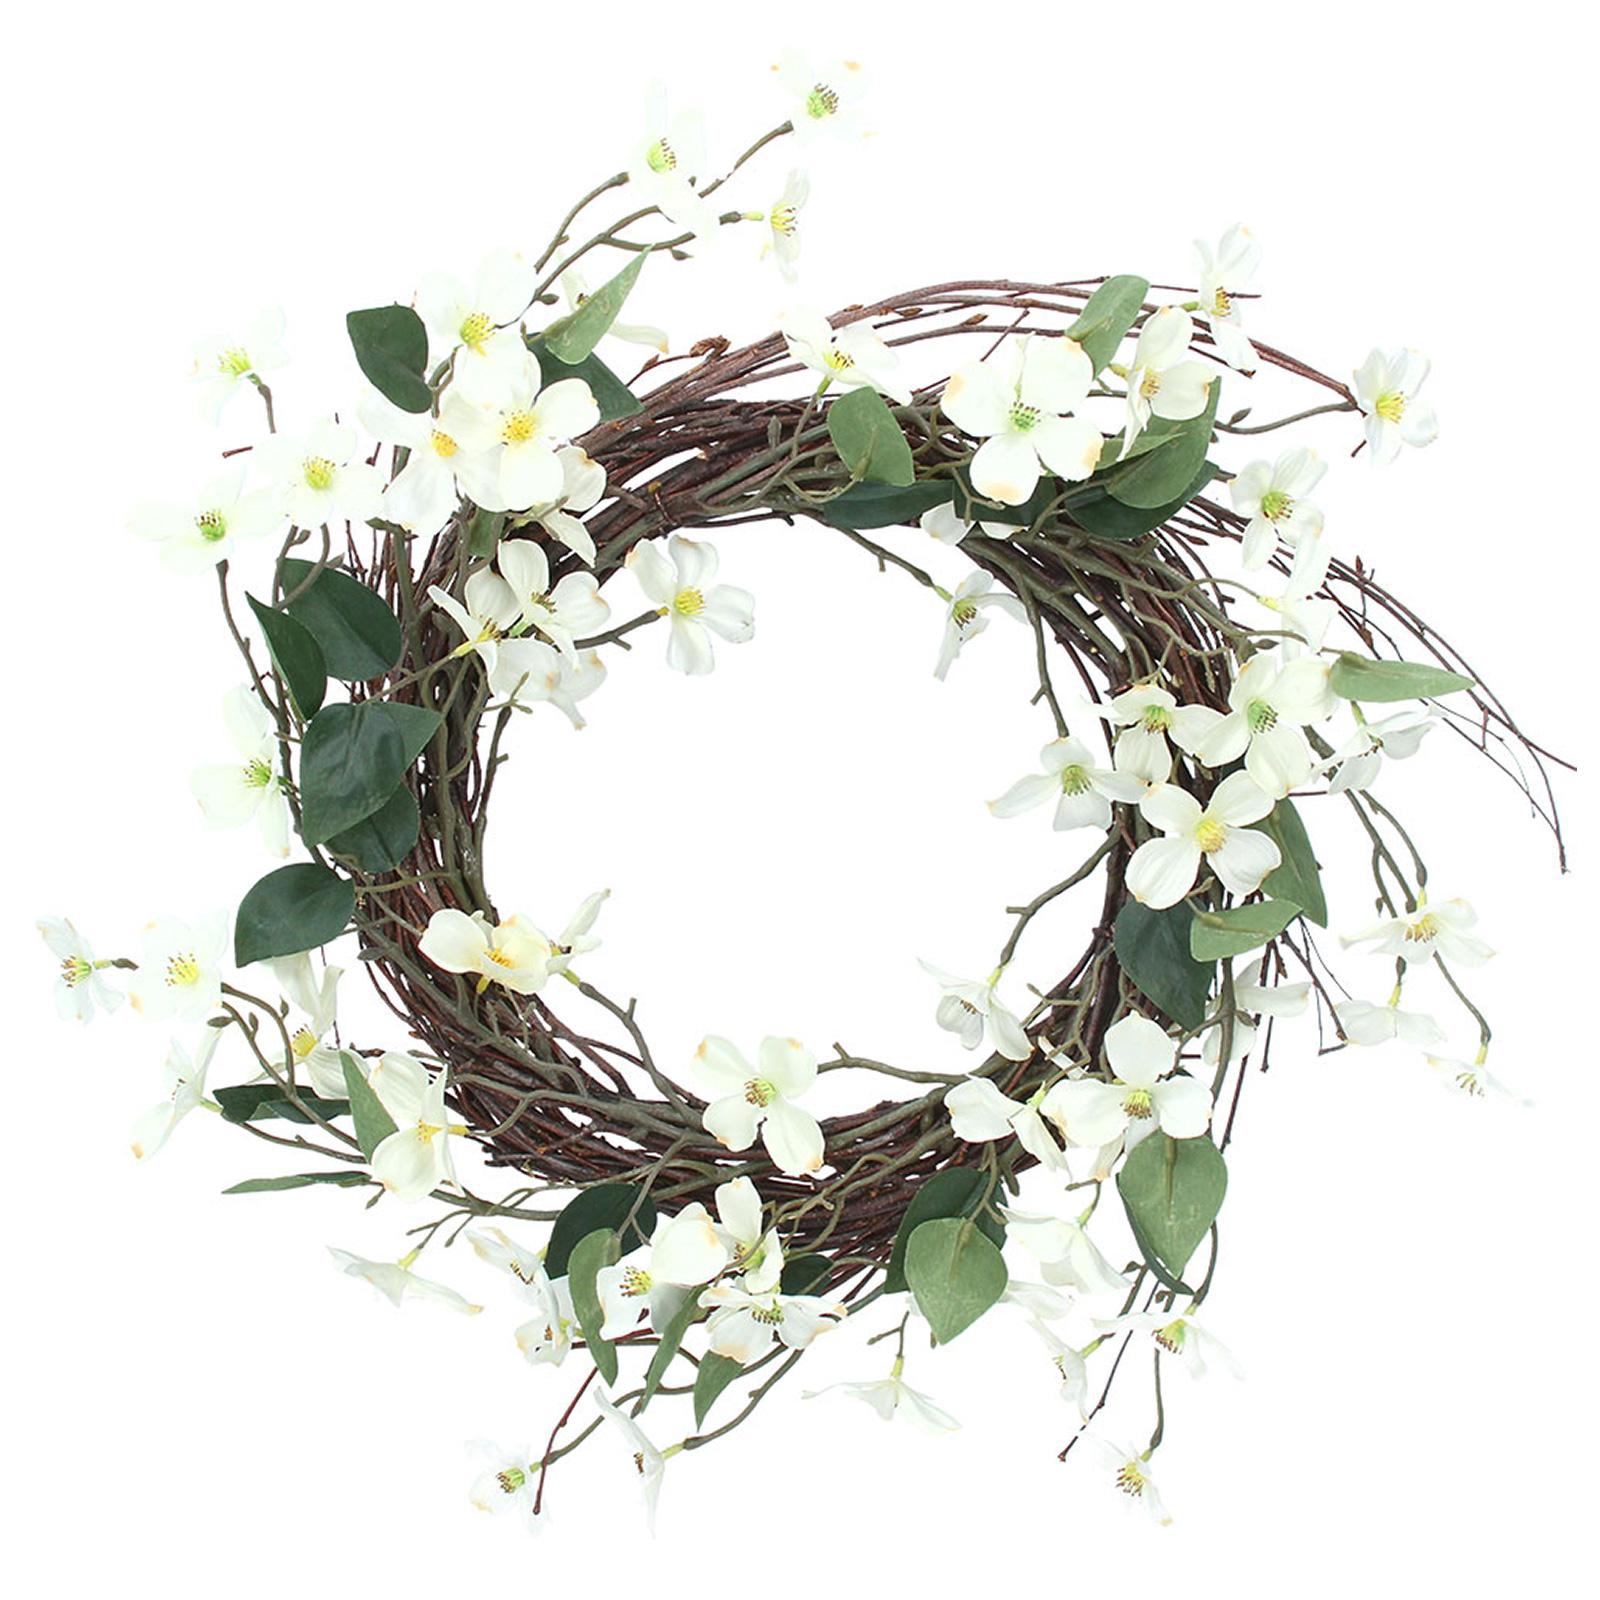 Gisela-Graham-Primavera-Corona-Decoracion-de-Mesa-de-huevos-de-Pascua-Flores-Casa-Puerta-Floral miniatura 26